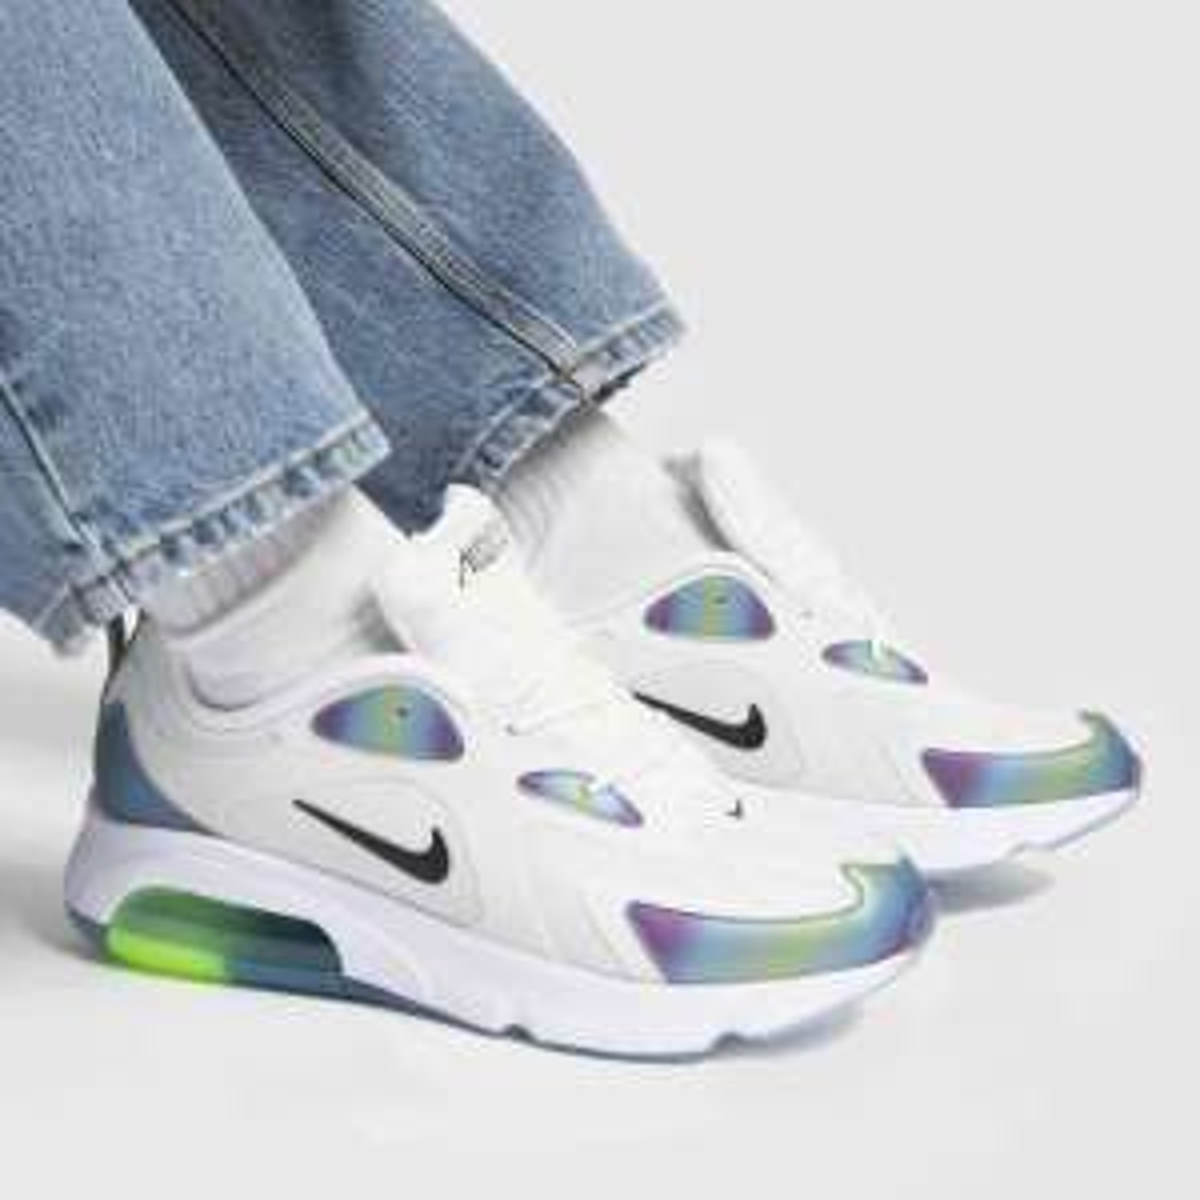 Nike white & pl blue air max 200 trainers £54.99 Schuh